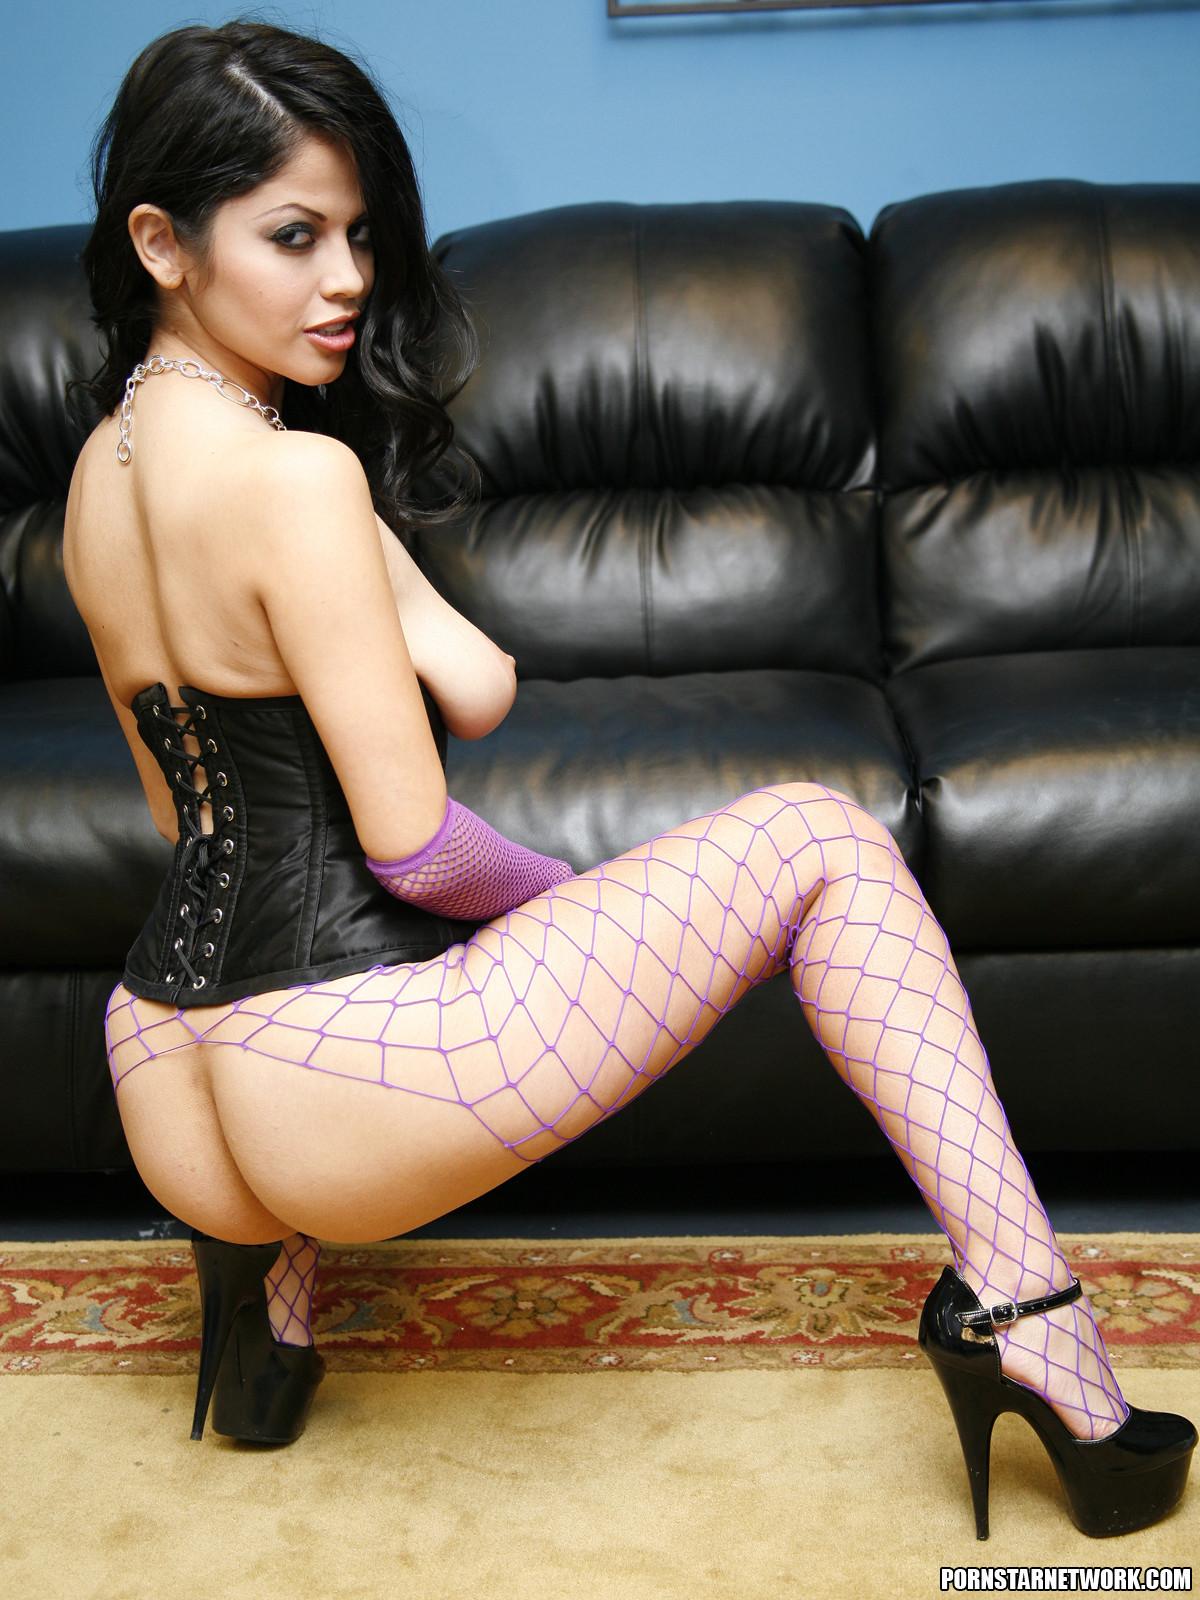 Эмма каммингс порно 3 фотография